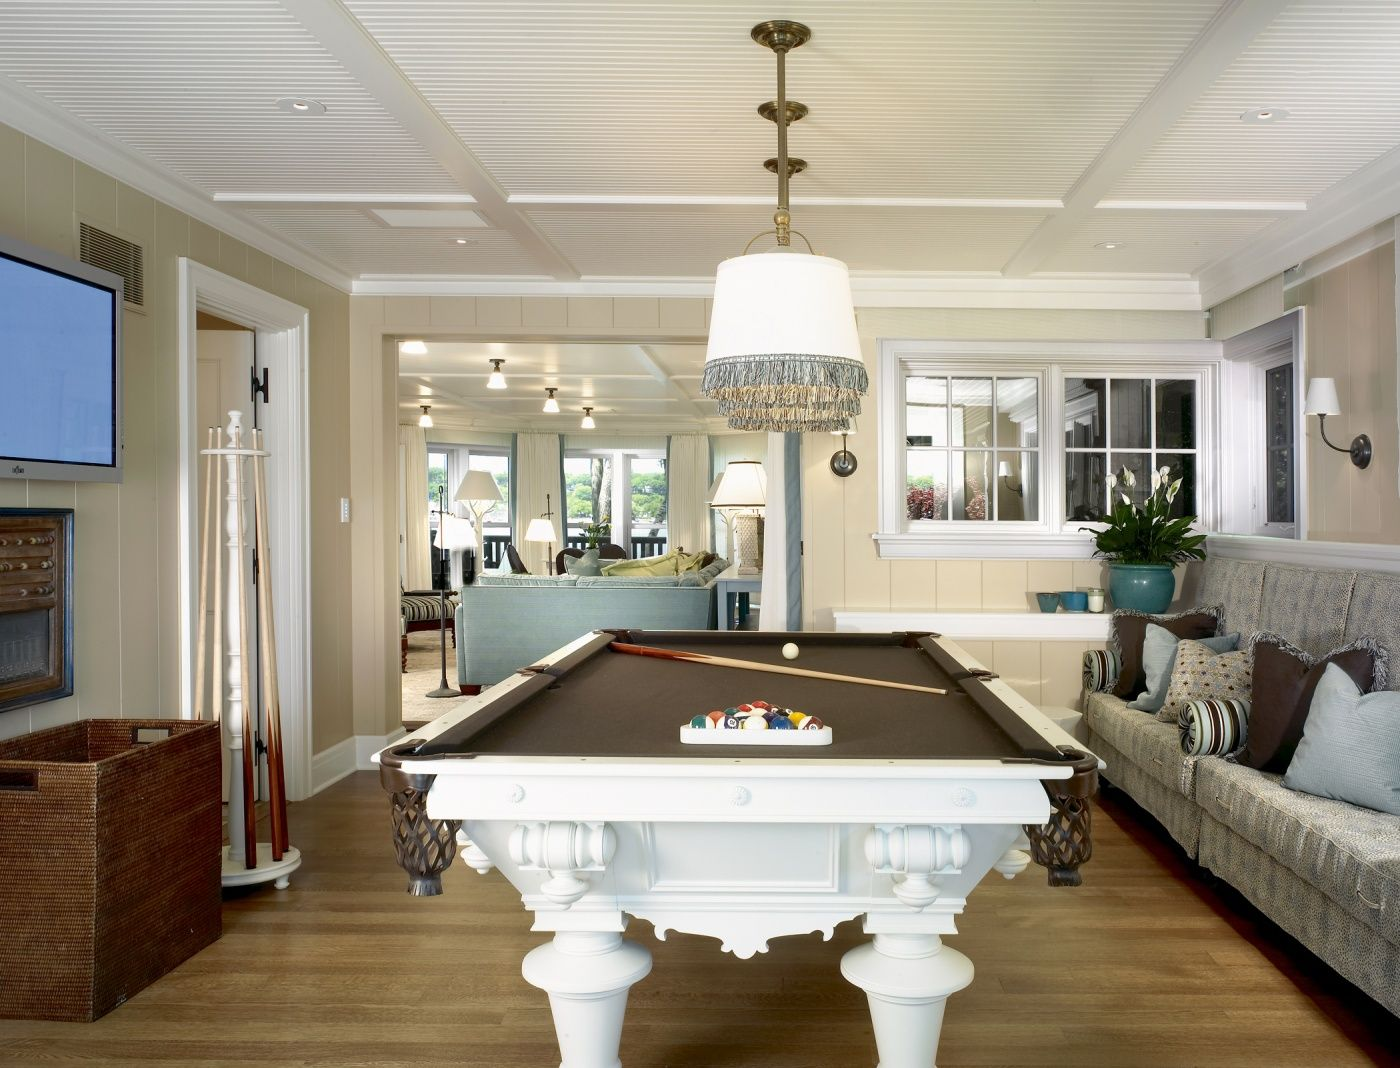 Gallery White Pool Table Pool Table Room Billards Room